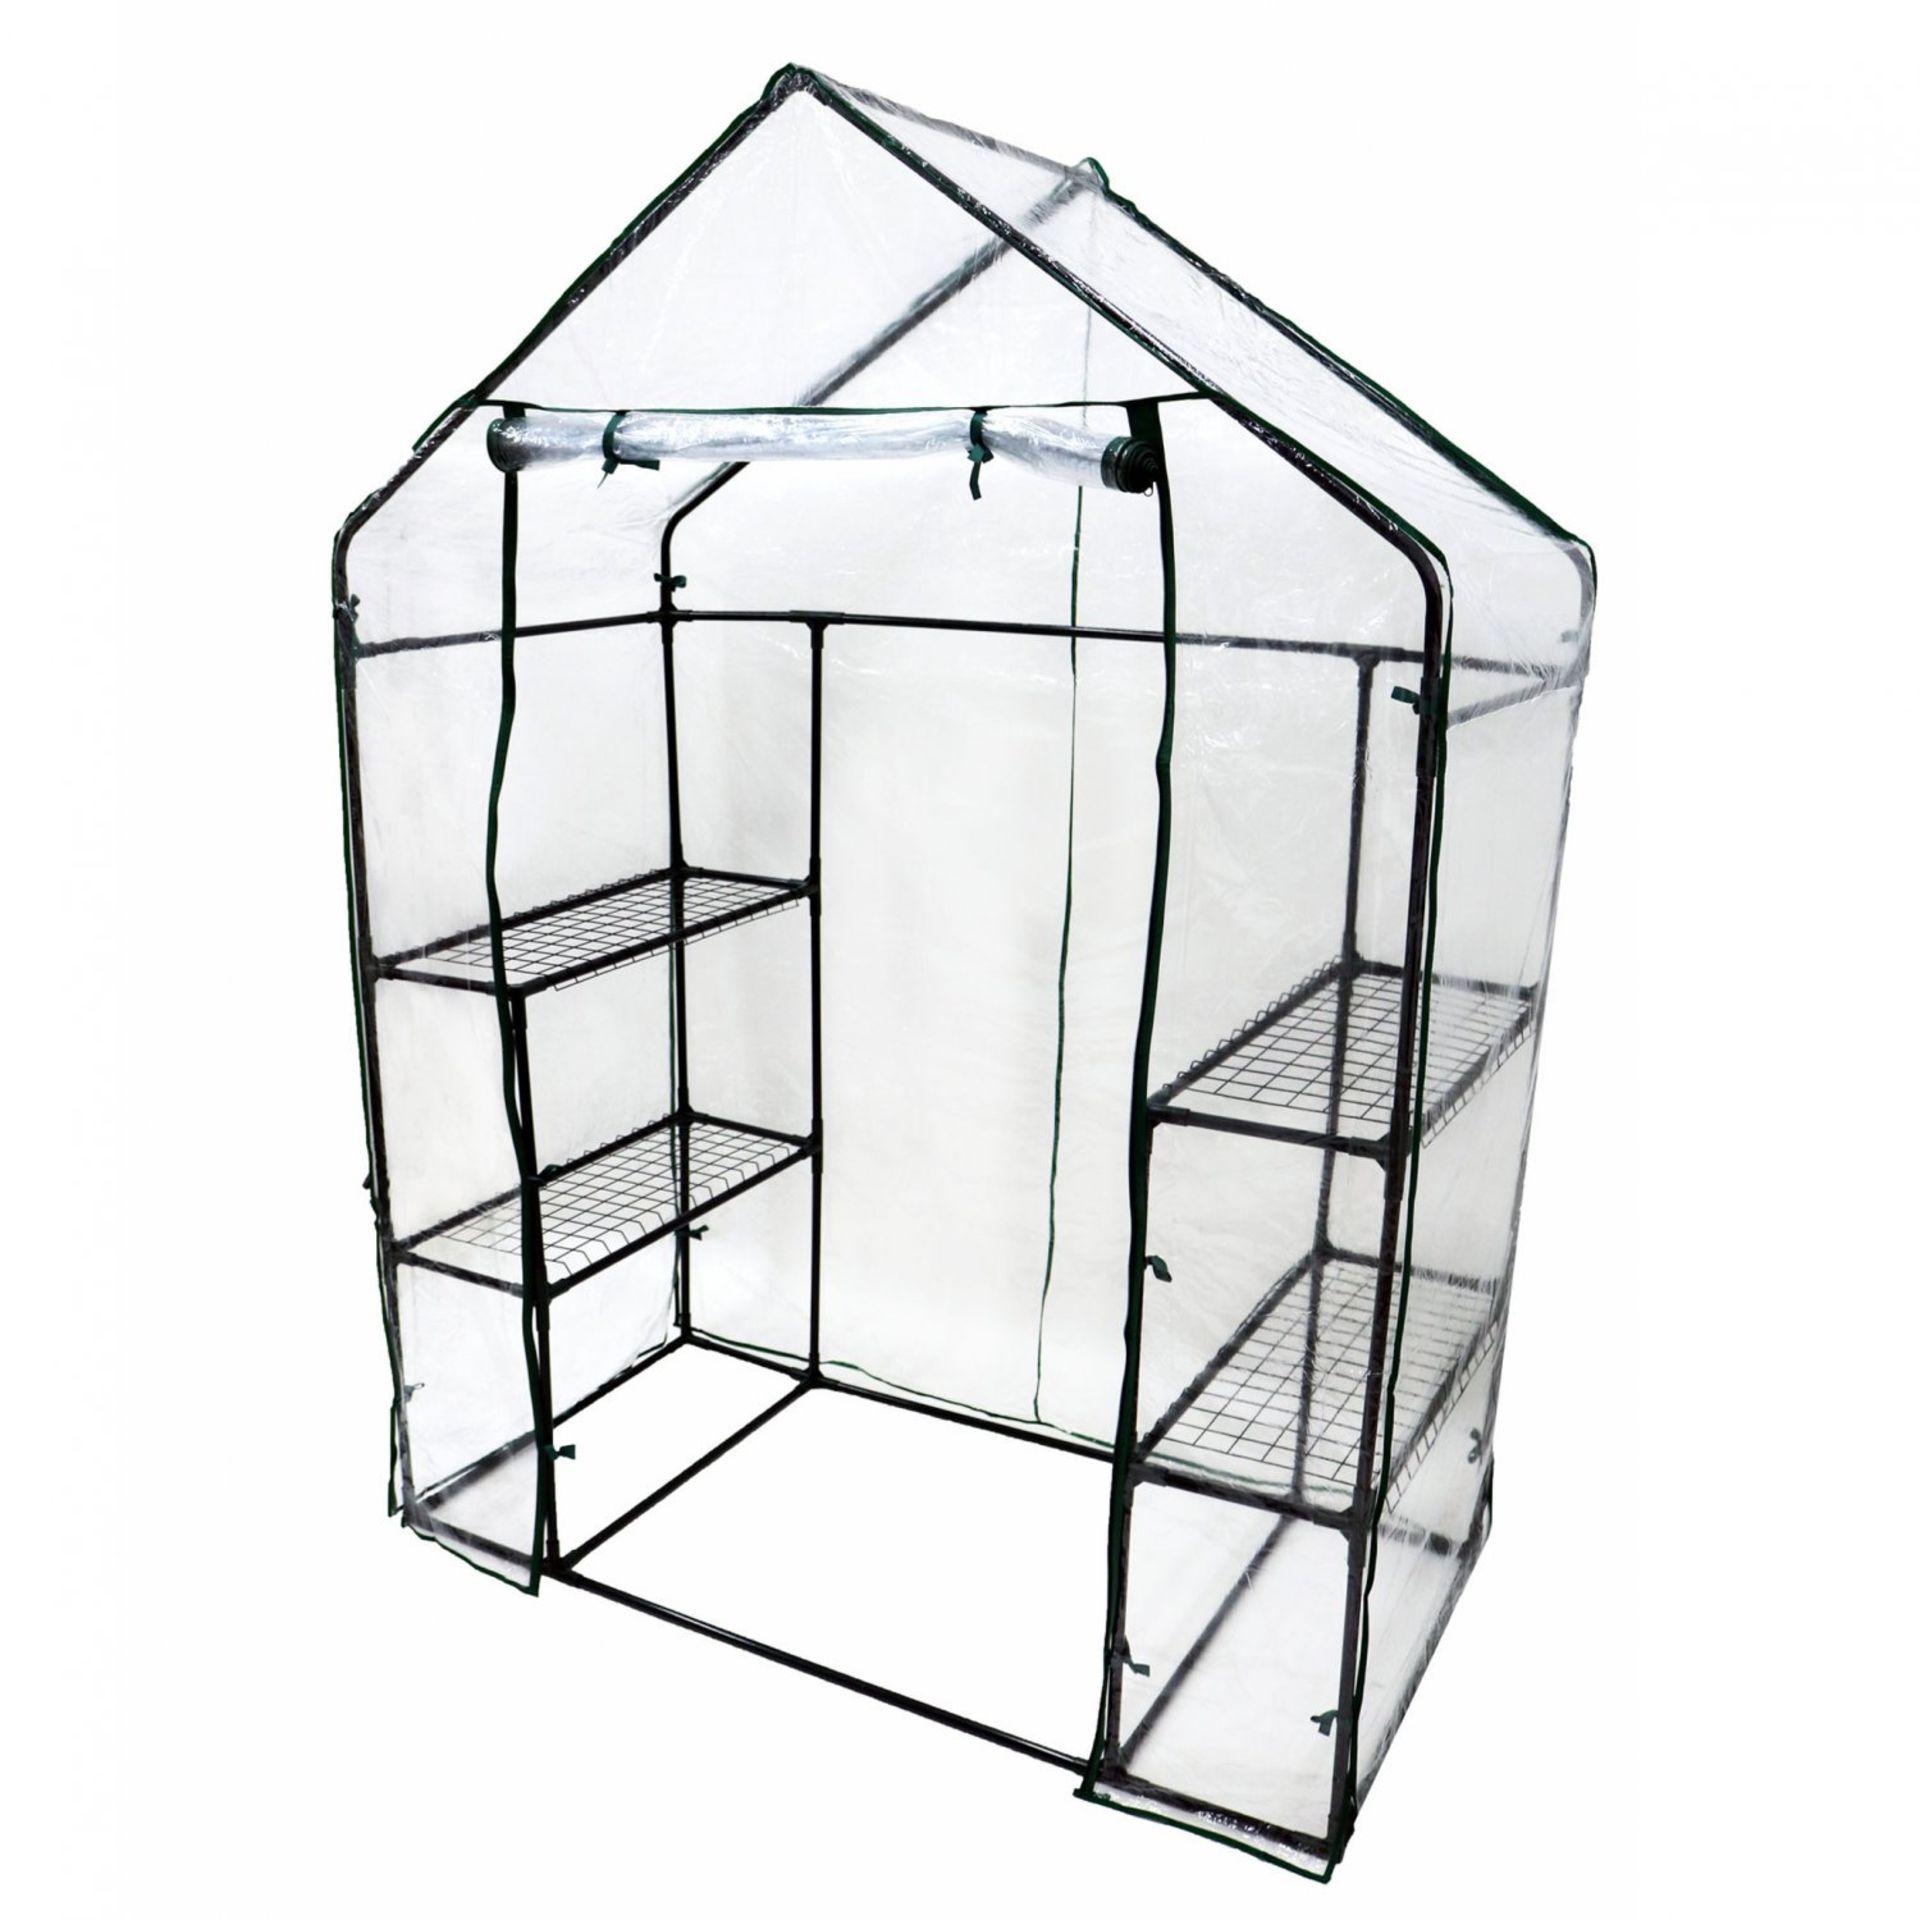 Lot 170 - (RL113) 3-Tier 4 Shelf Mini Walk-in Growhouse Garden Greenhouse Our 3-tier Grow House p...